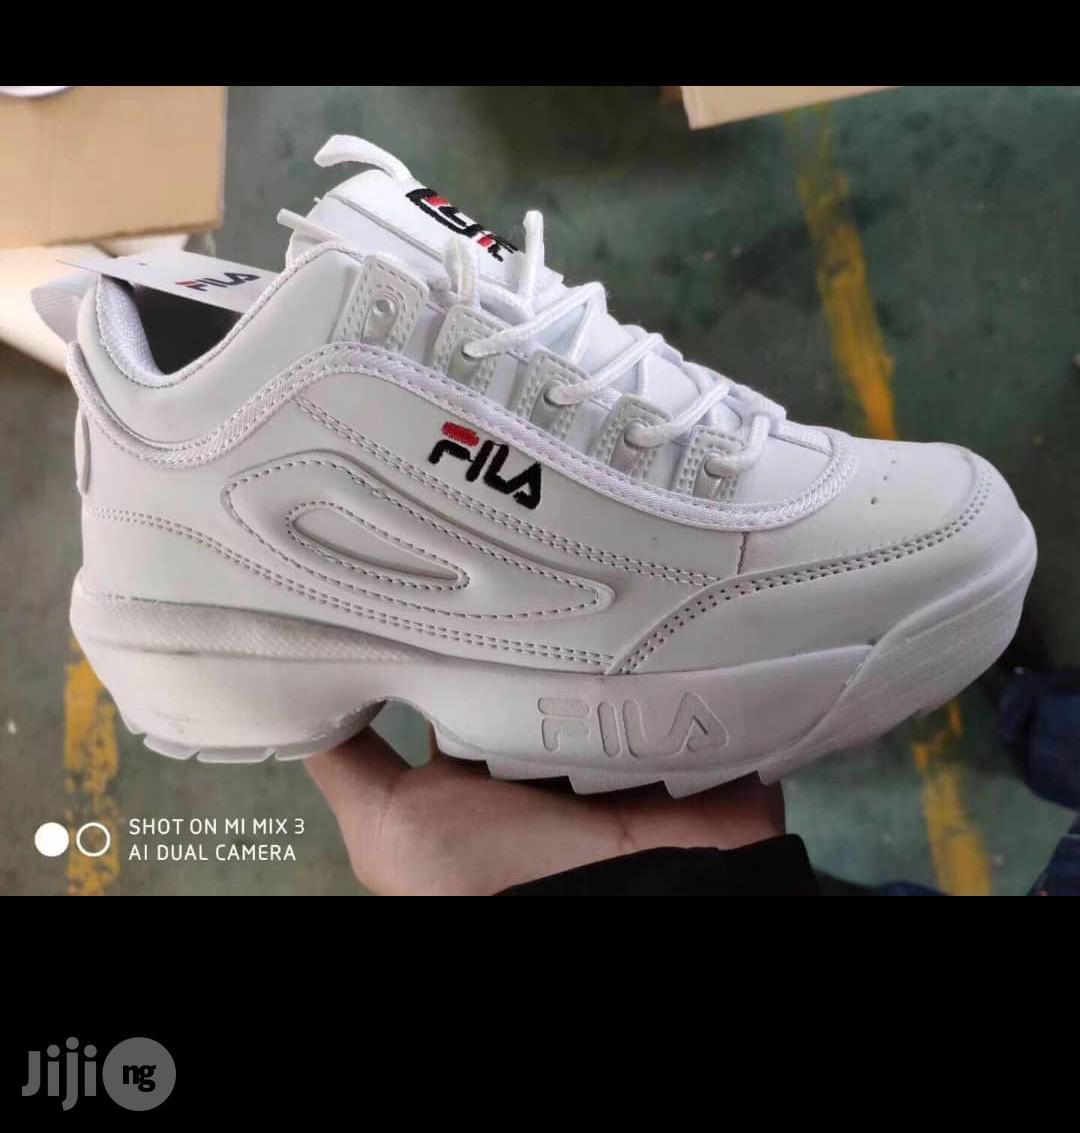 Fila Sneakers in Ifako-Ijaiye - Shoes